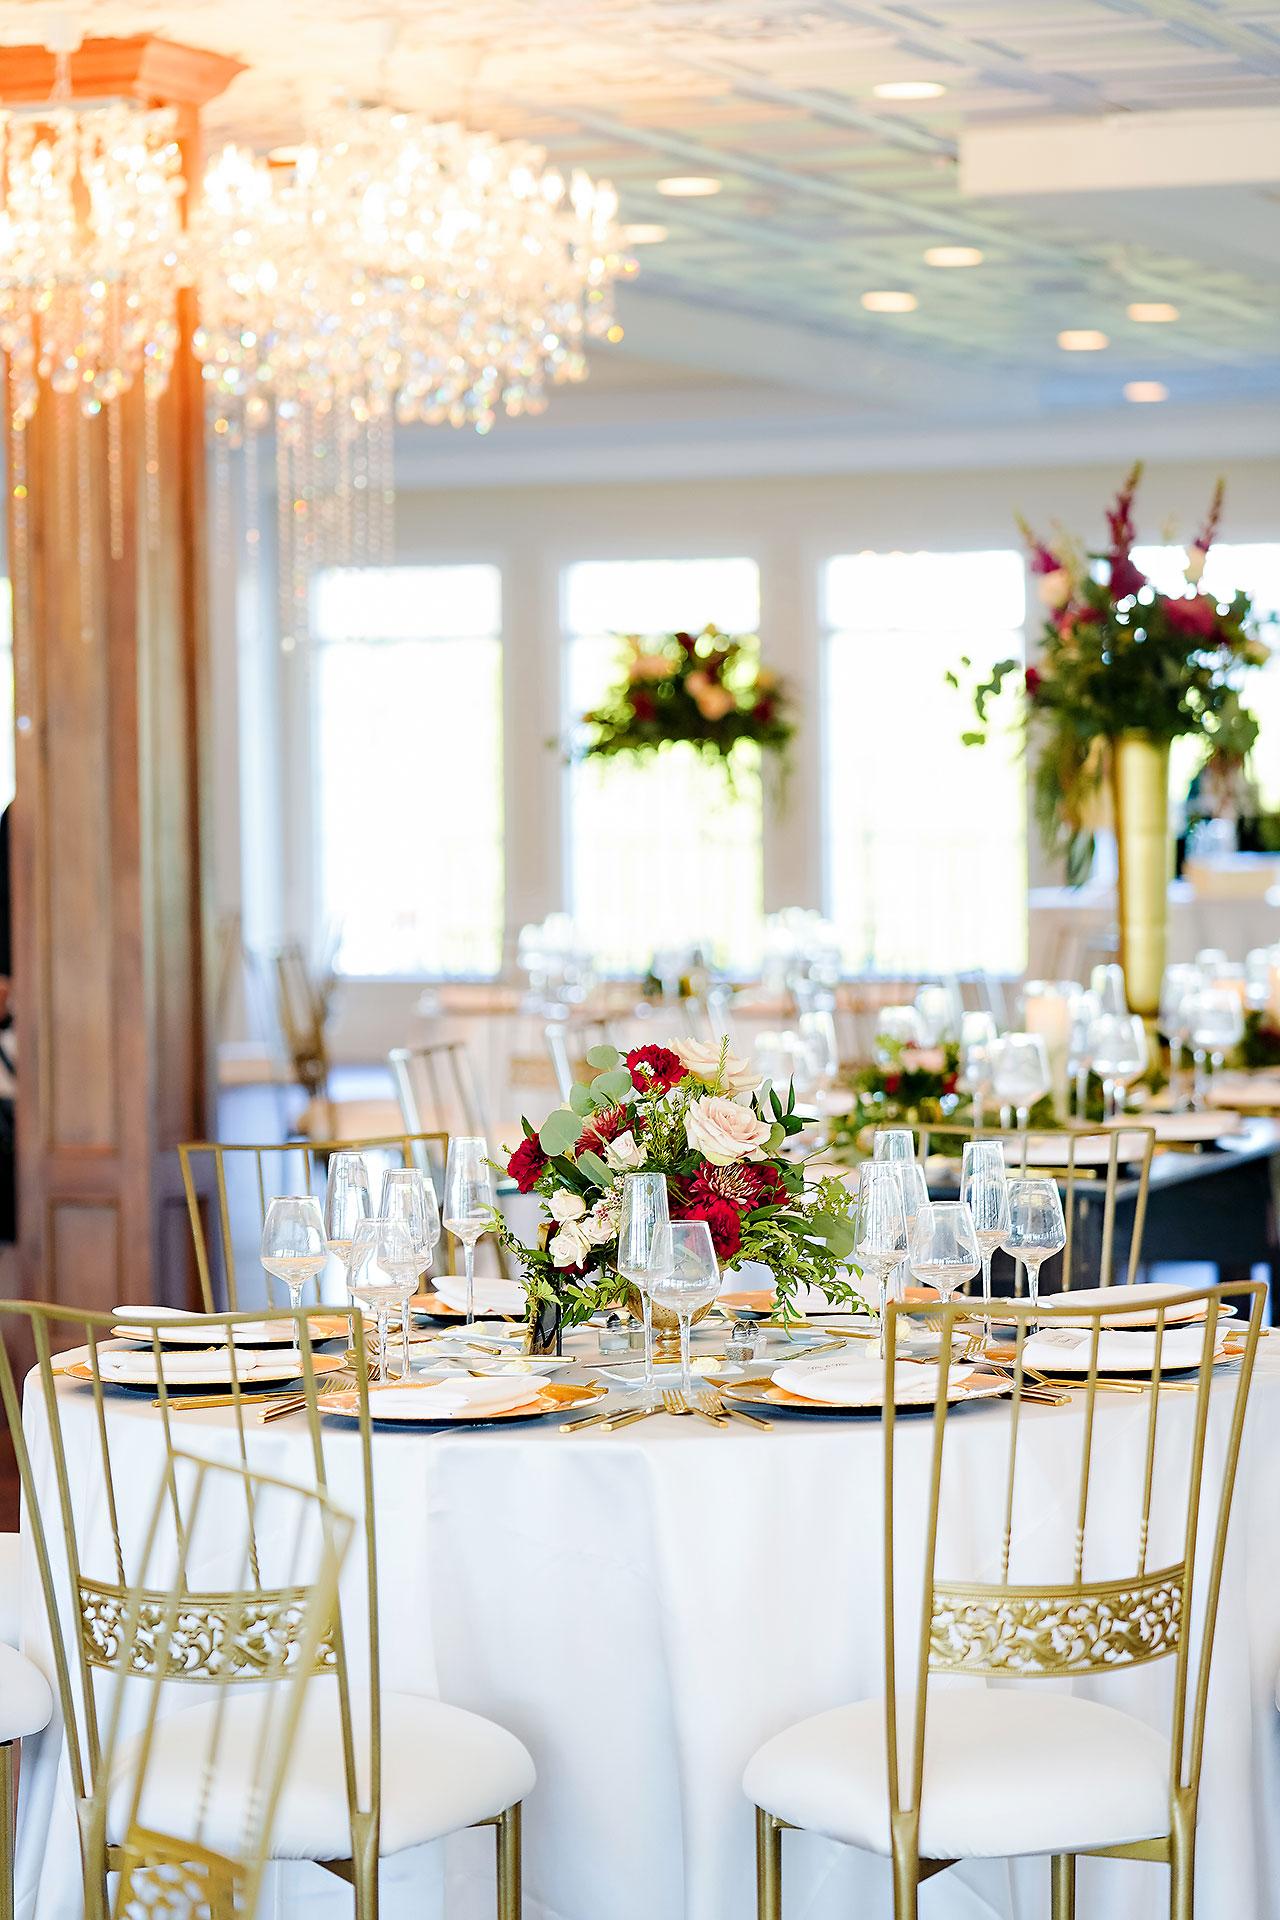 Nadia Parker Black Iris Estate Carmel Indiana Wedding May 2021 227